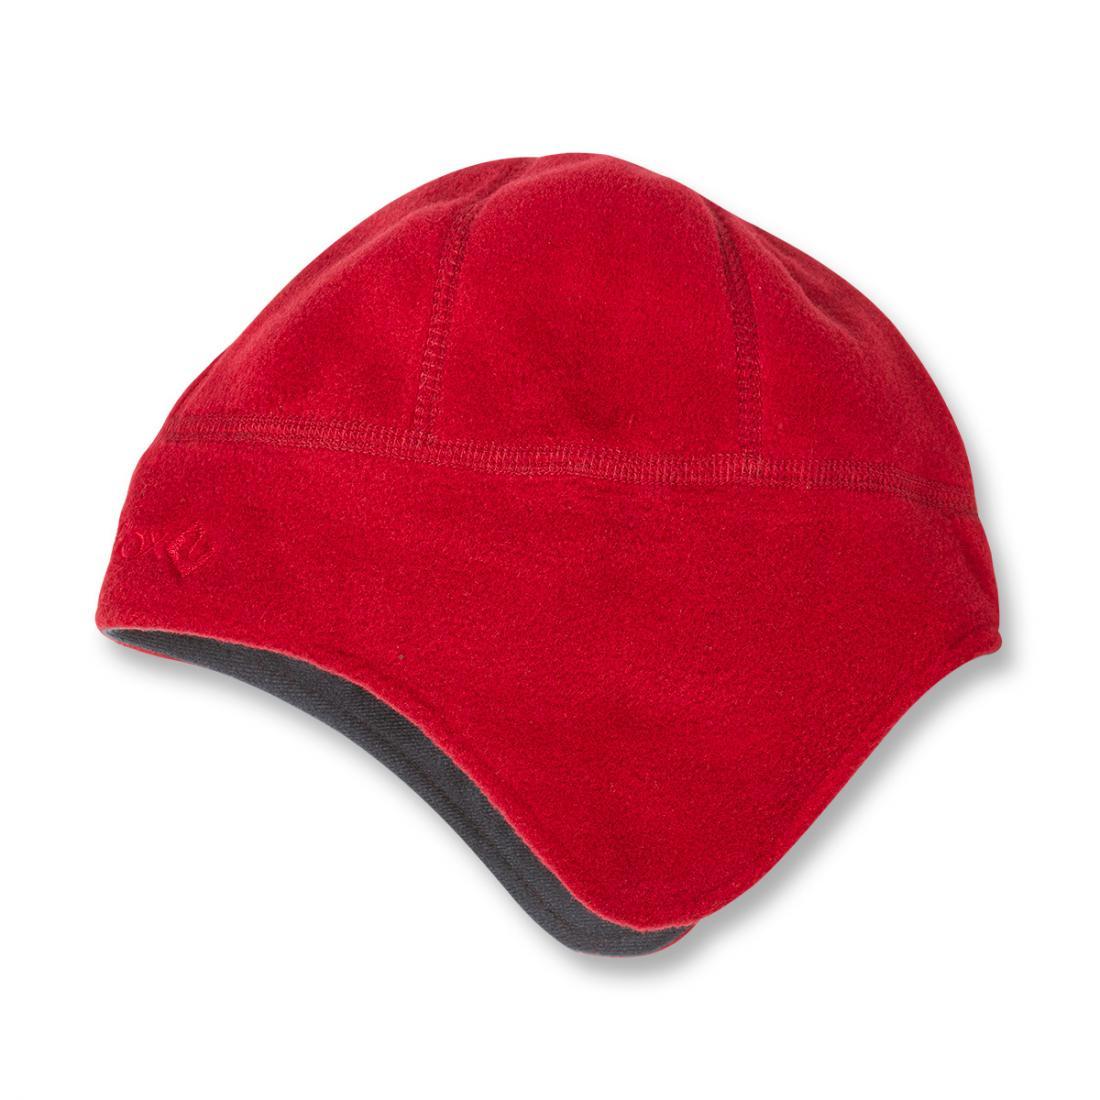 Шапка FiordШапки<br><br><br>Цвет: Красный<br>Размер: 56